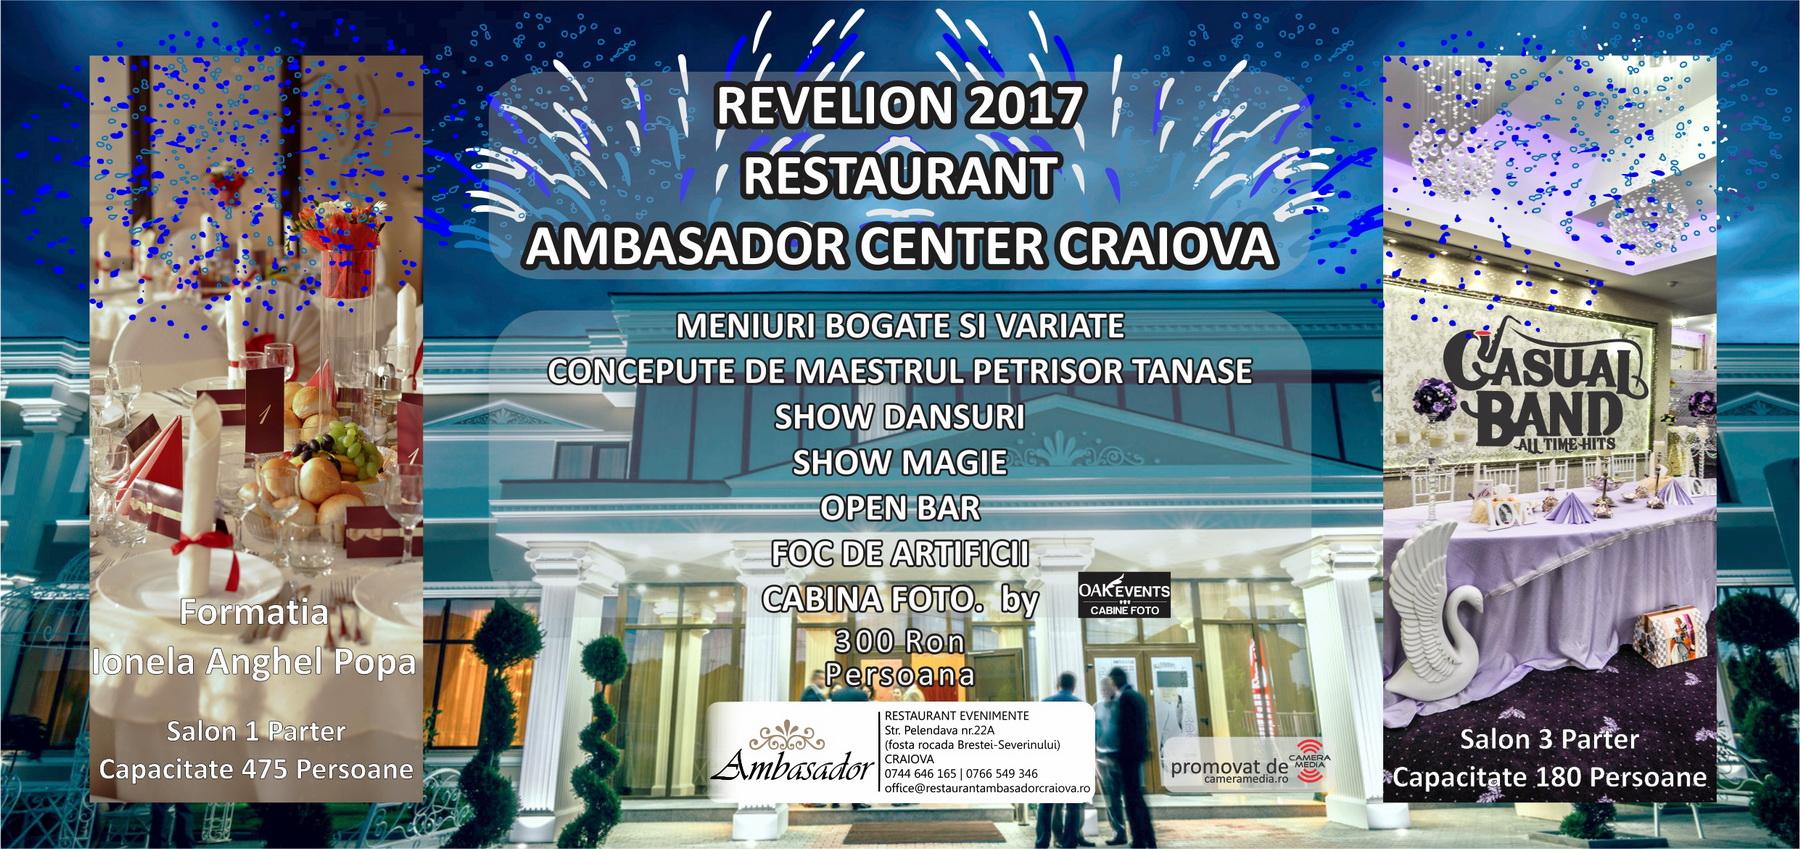 Revelion 2017 Craiova | Restaurant Nunta, Botez, Corporate, Evenimente Craiova | Ambasador Center Craiova